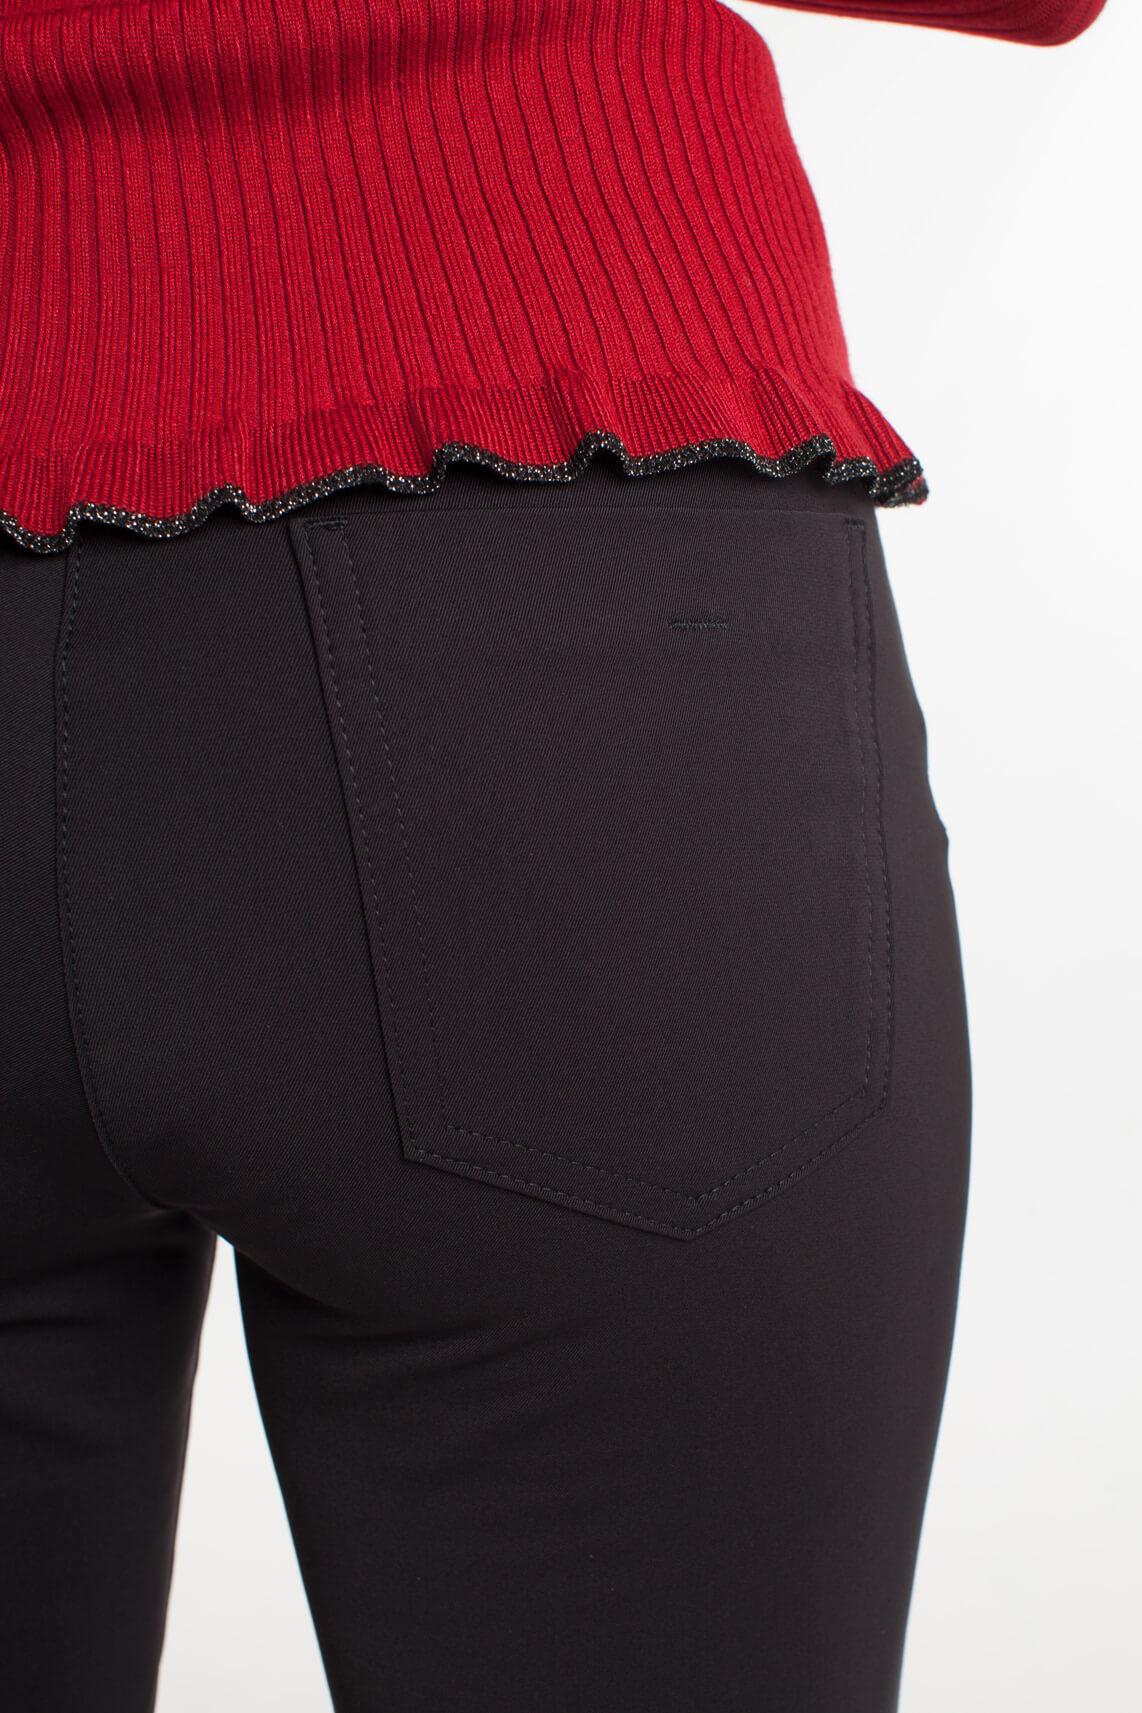 Rosner Dames Audrey pantalon zwart